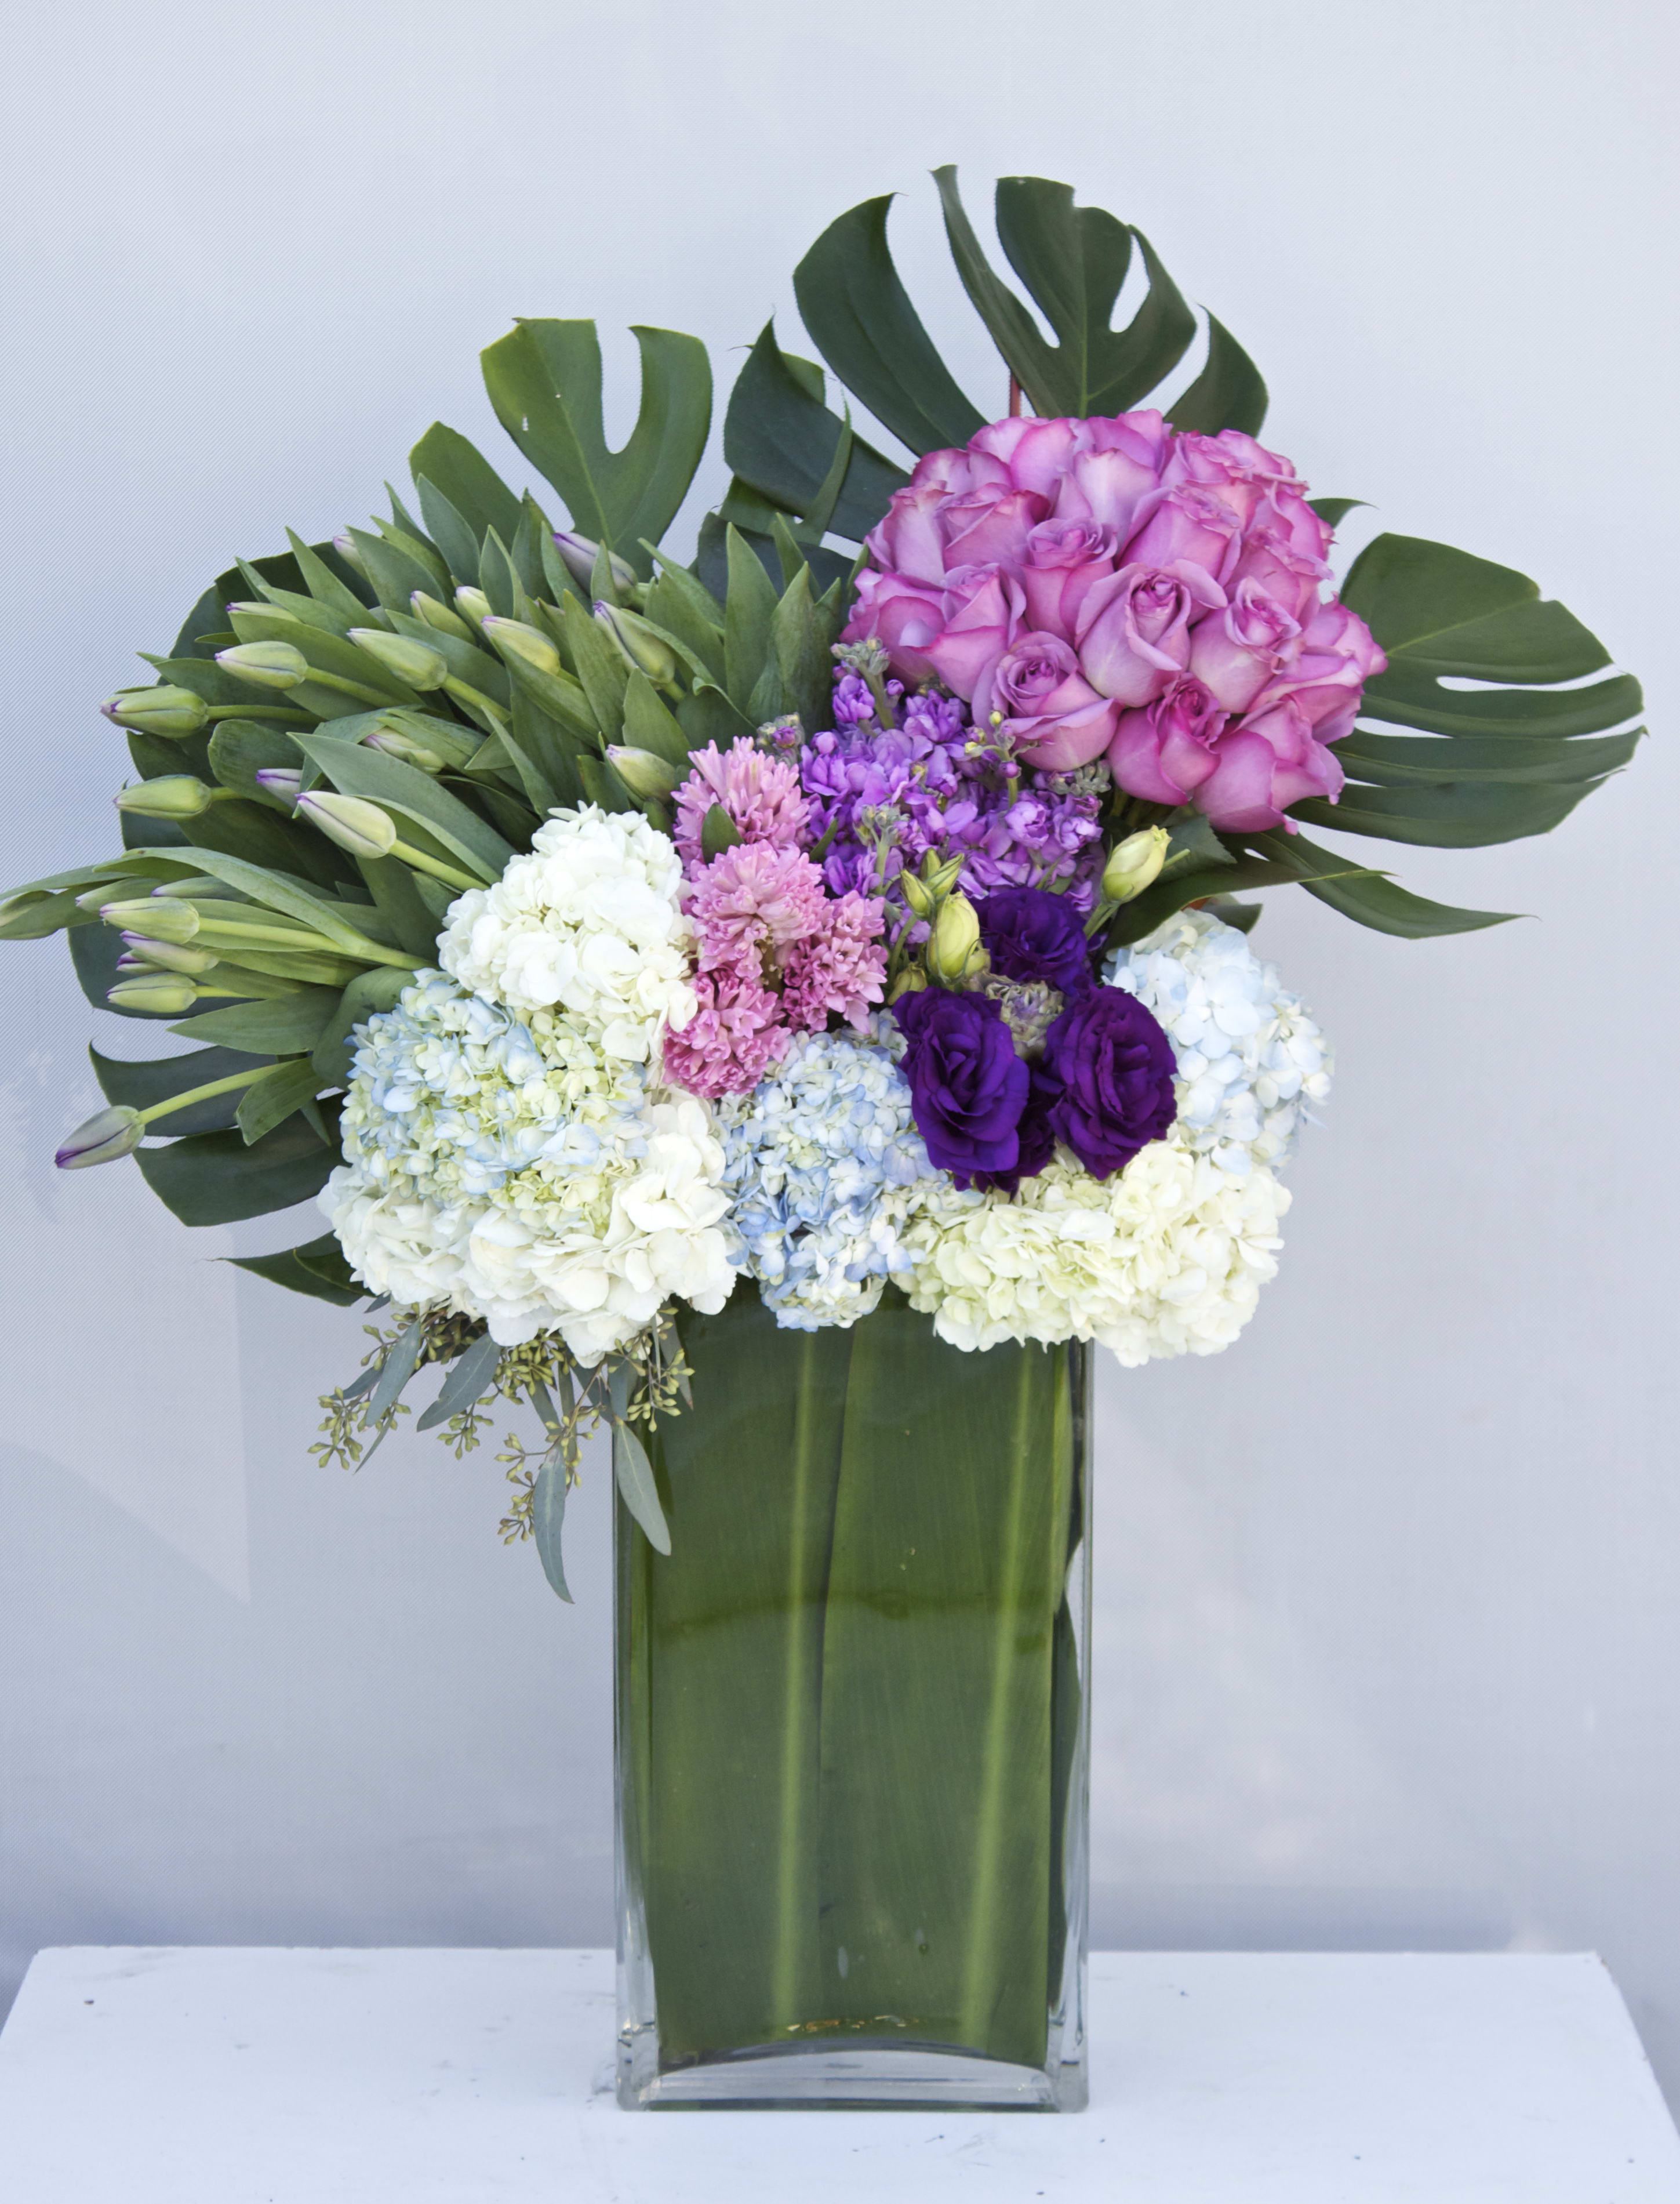 Tall Spring Bouquet In A Glass Vase in Glendale, CA | Kara